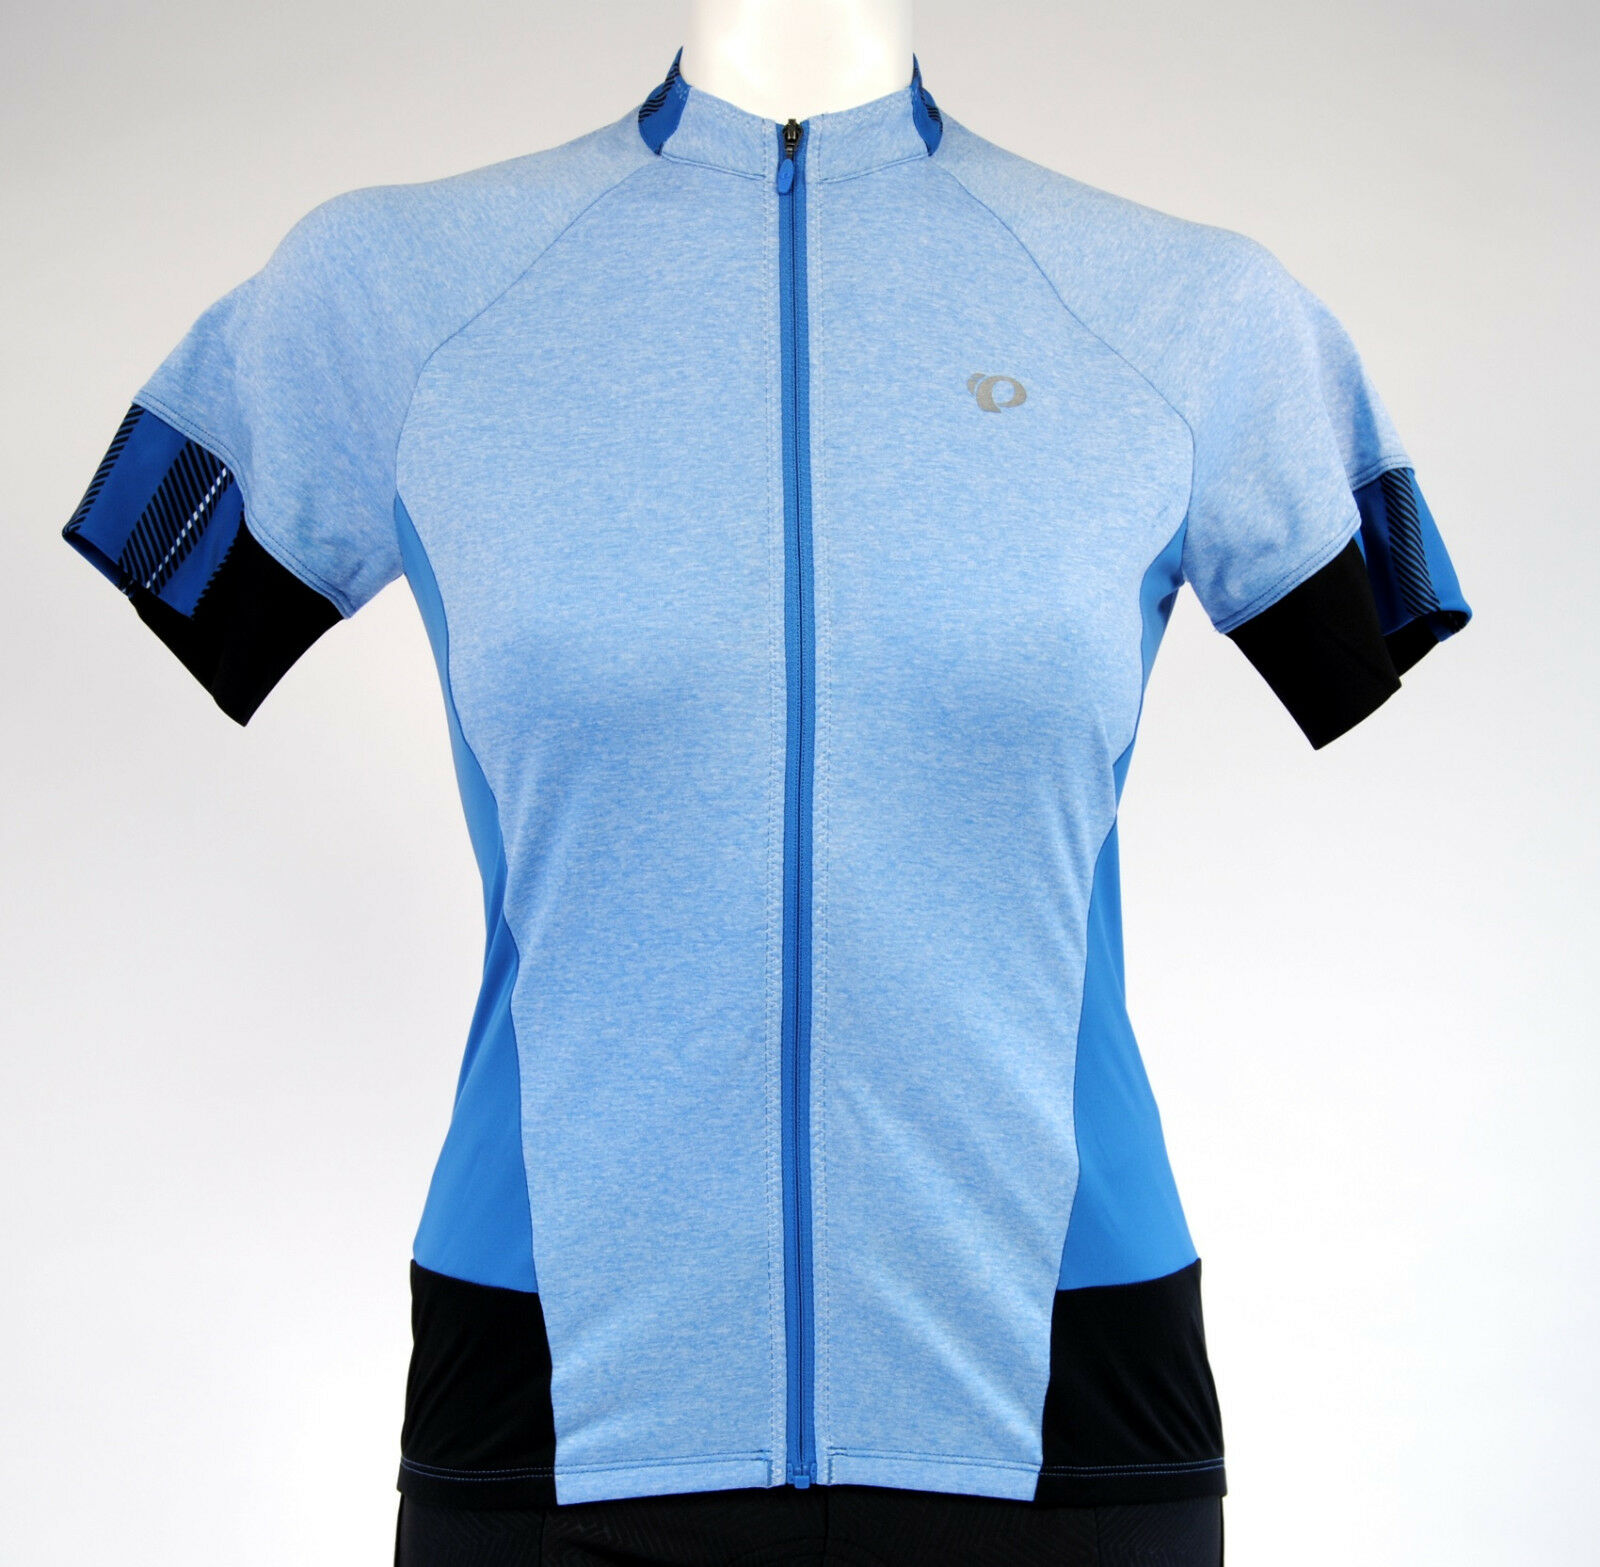 Pearl Izumi Select Escape Cycling SS Jersey,Women's, Medium, Heather bluee